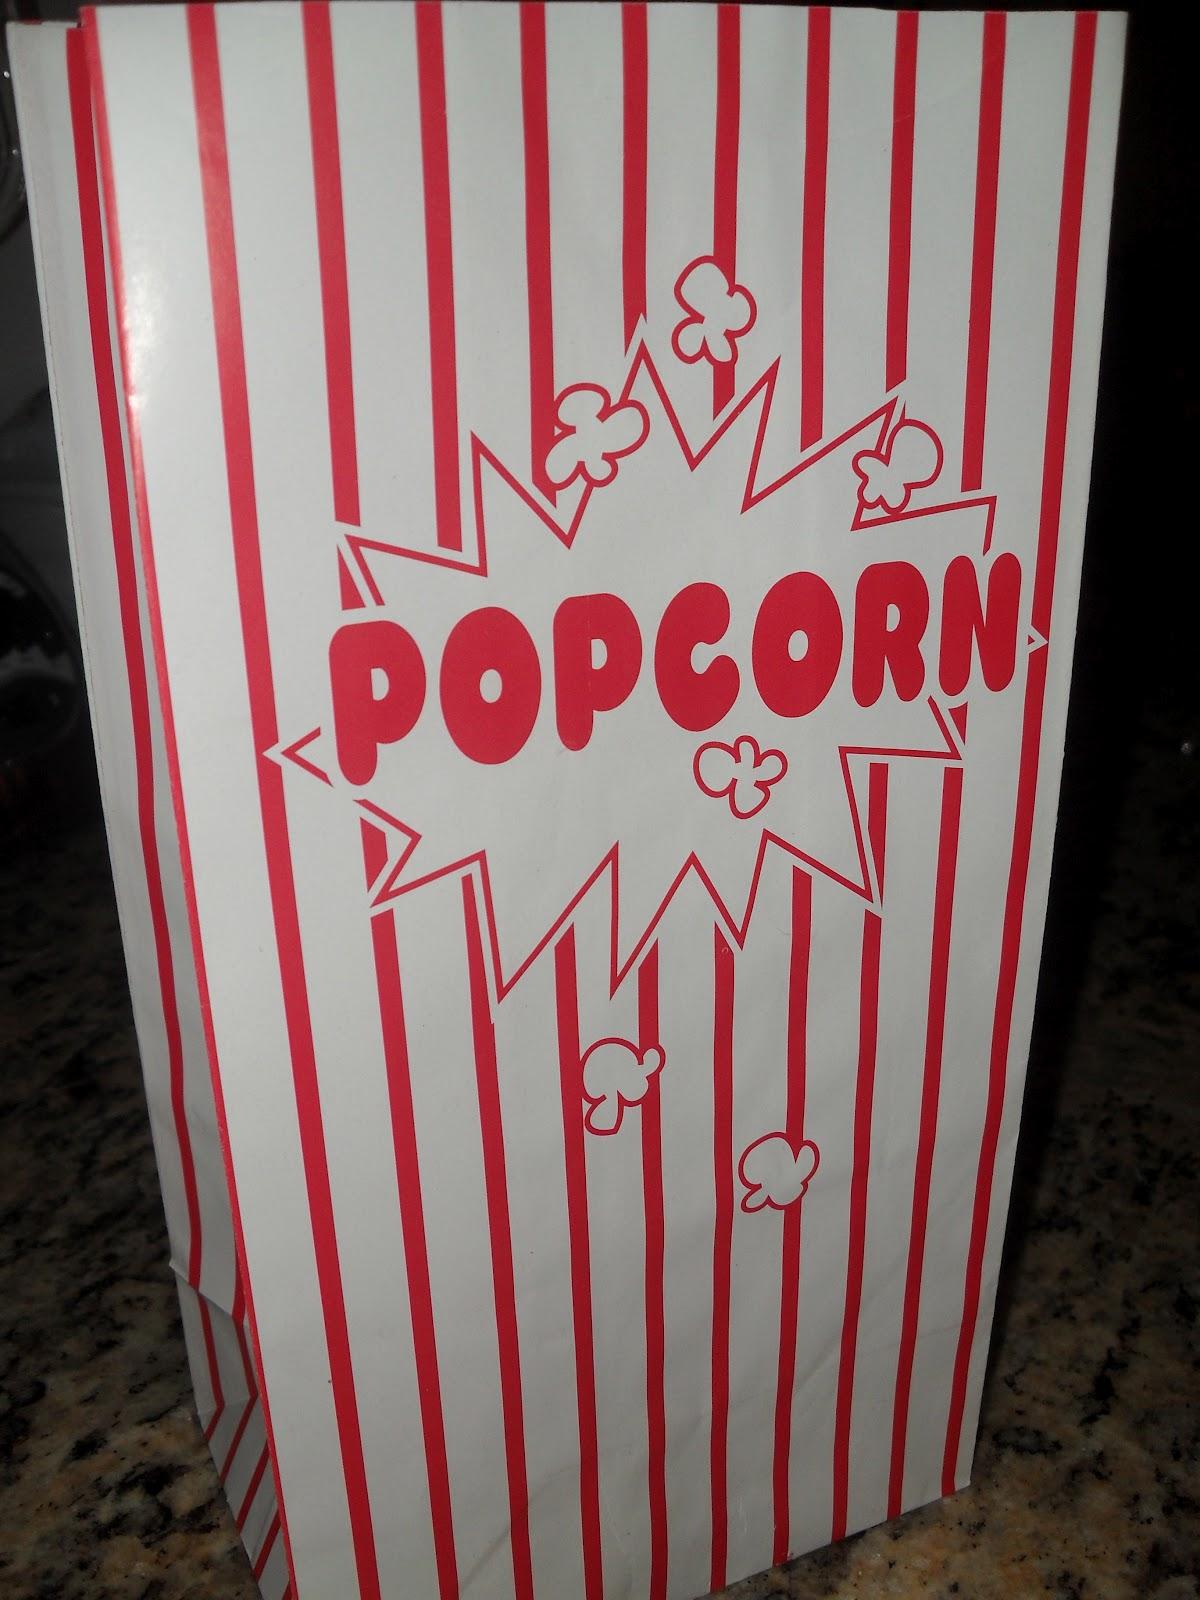 Popcorn Bag Printable Bag of popcorn for the